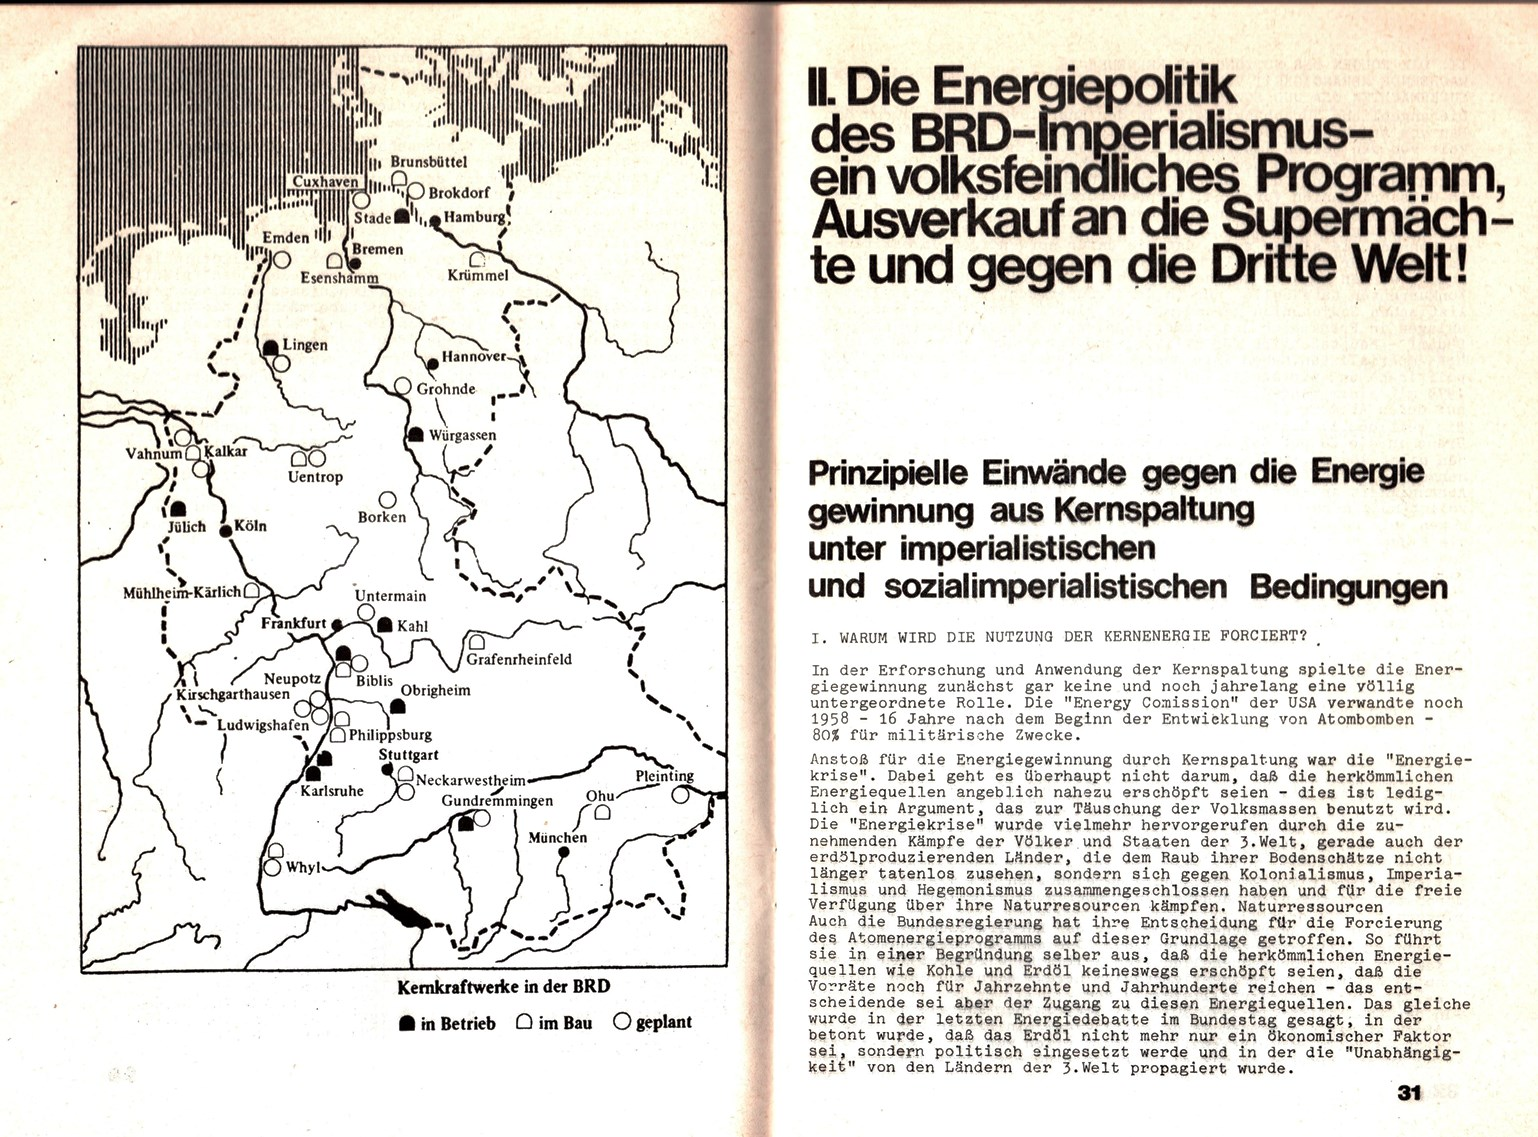 KSV_1976_Atomenergie_im_Kapitalismus_017